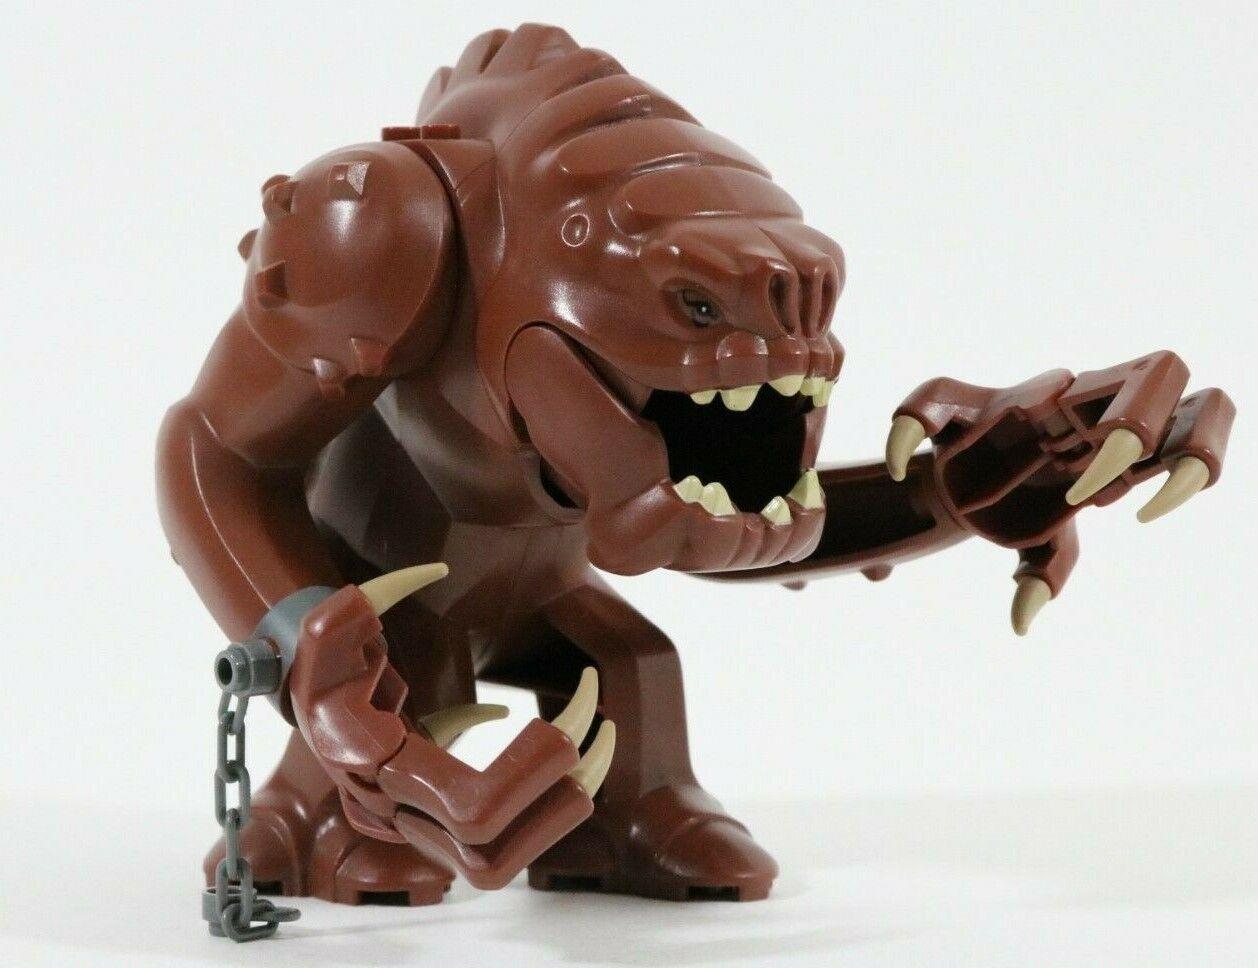 RARE Lego Star Wars Rancor bigfig créature 75005 rancor pit très bon état